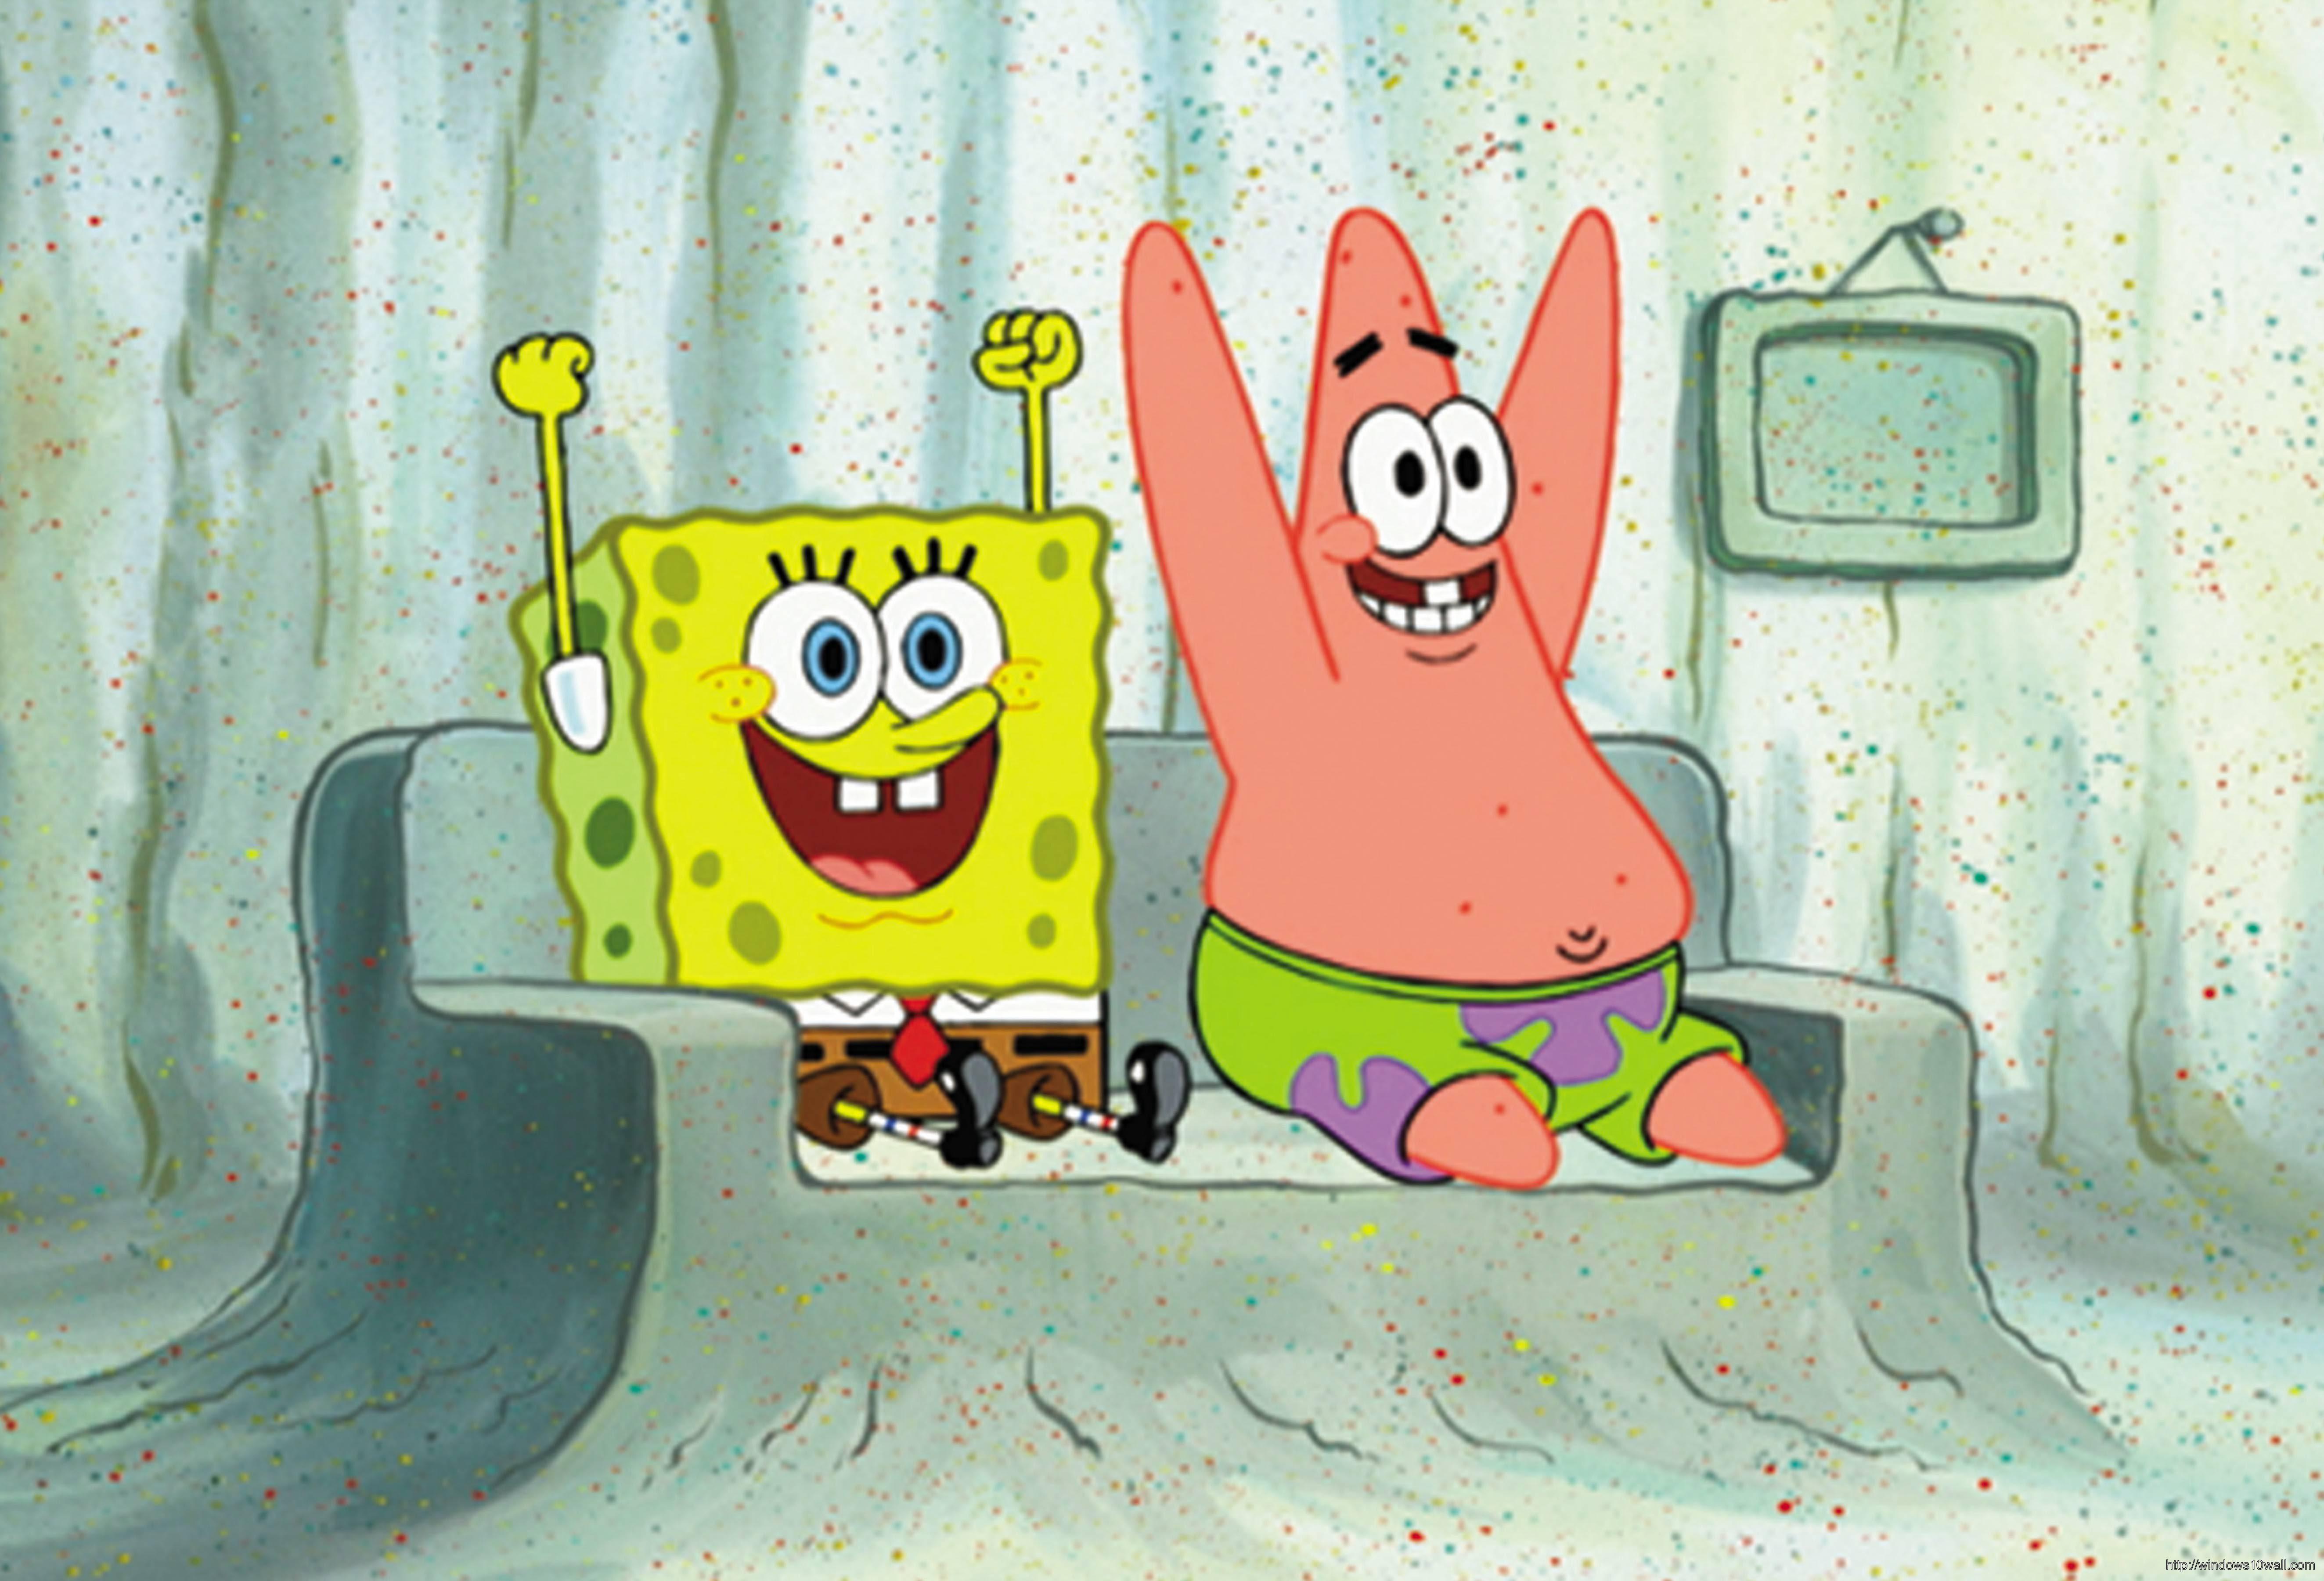 spongebob-and-patrick-background-wallpaper